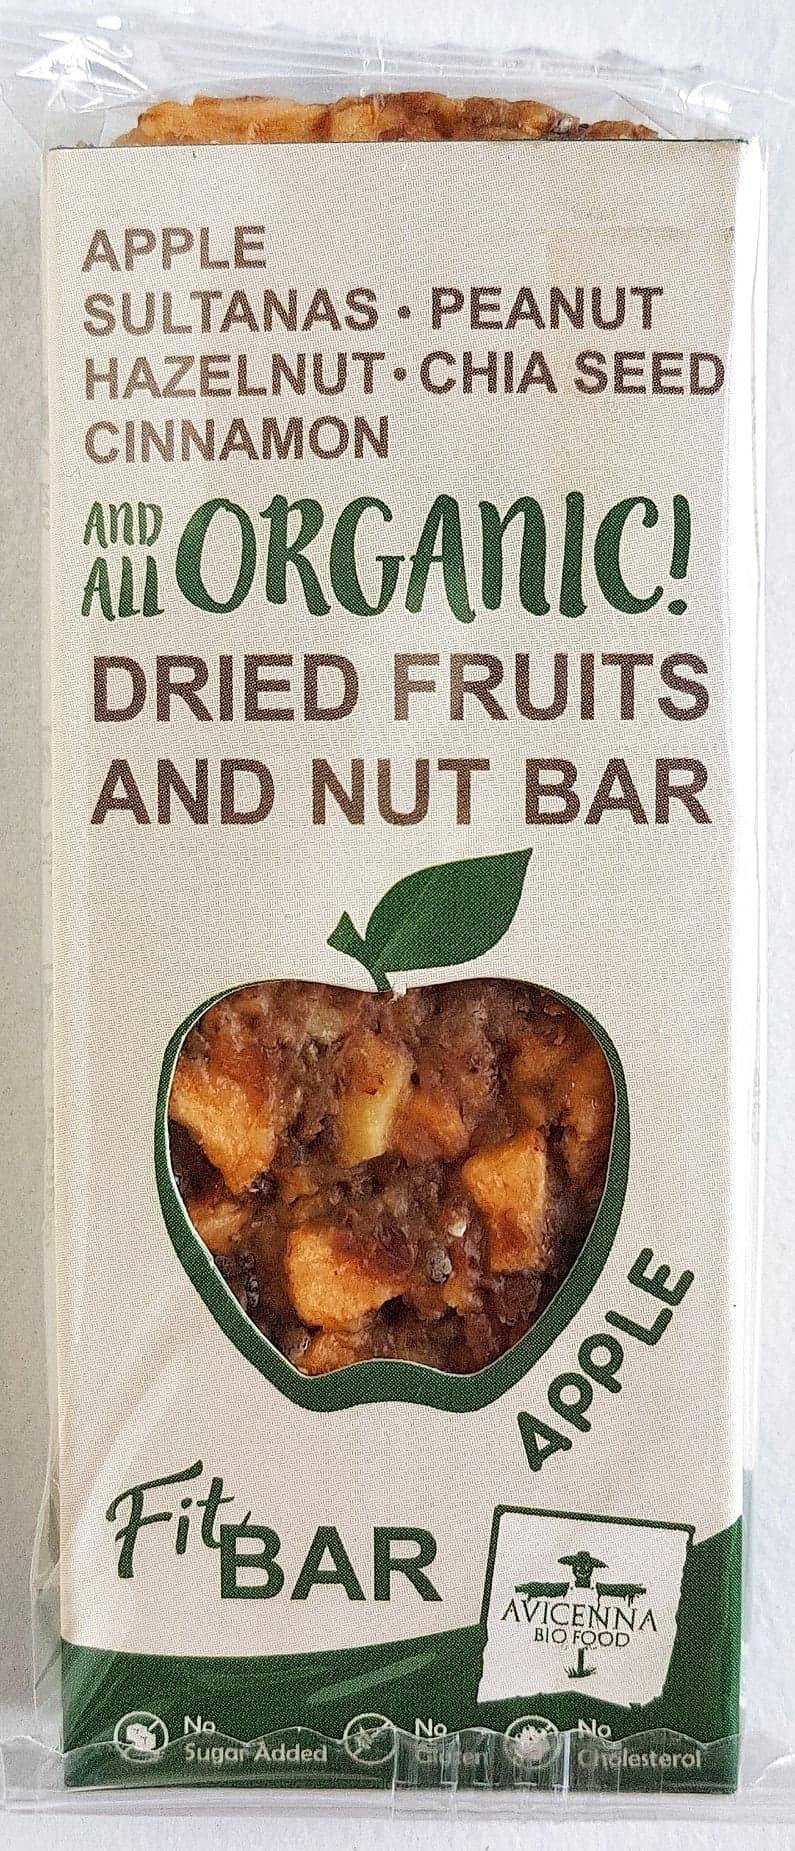 Avicenna Bio Food Fit Bar Apple